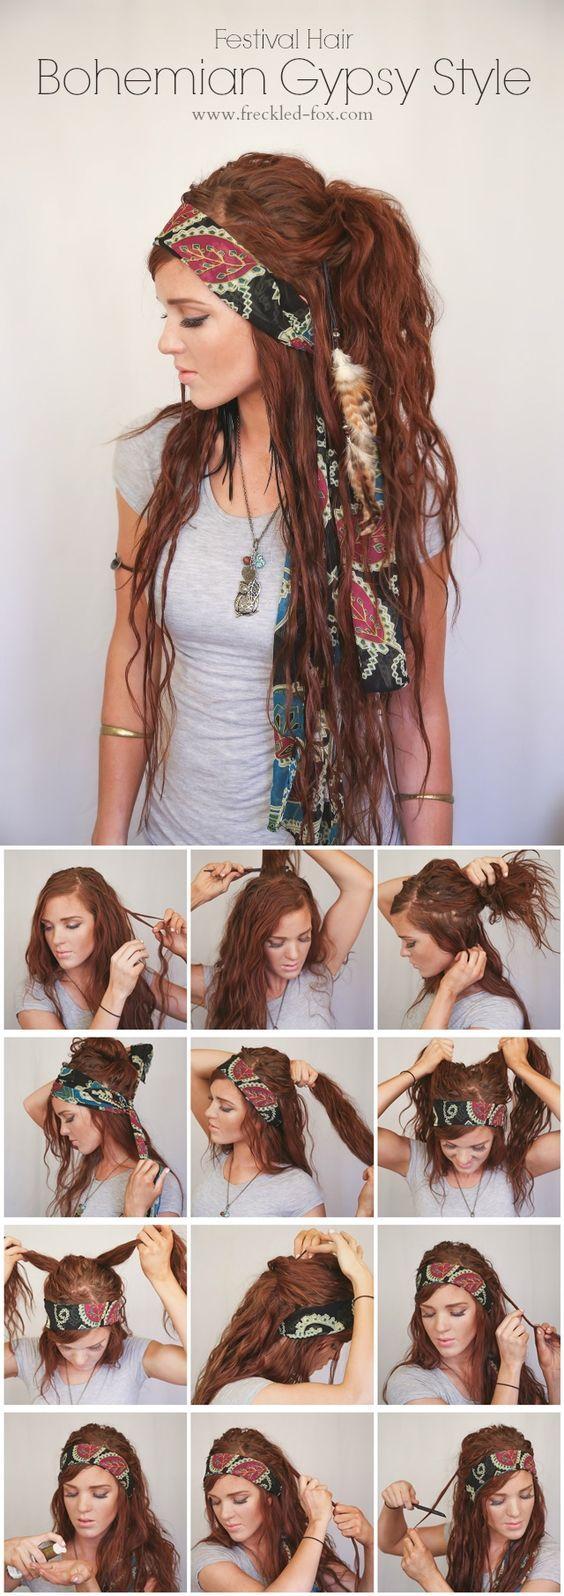 Outstanding 1000 Ideas About Hippie Hair Short On Pinterest Short Hair Short Hairstyles Gunalazisus